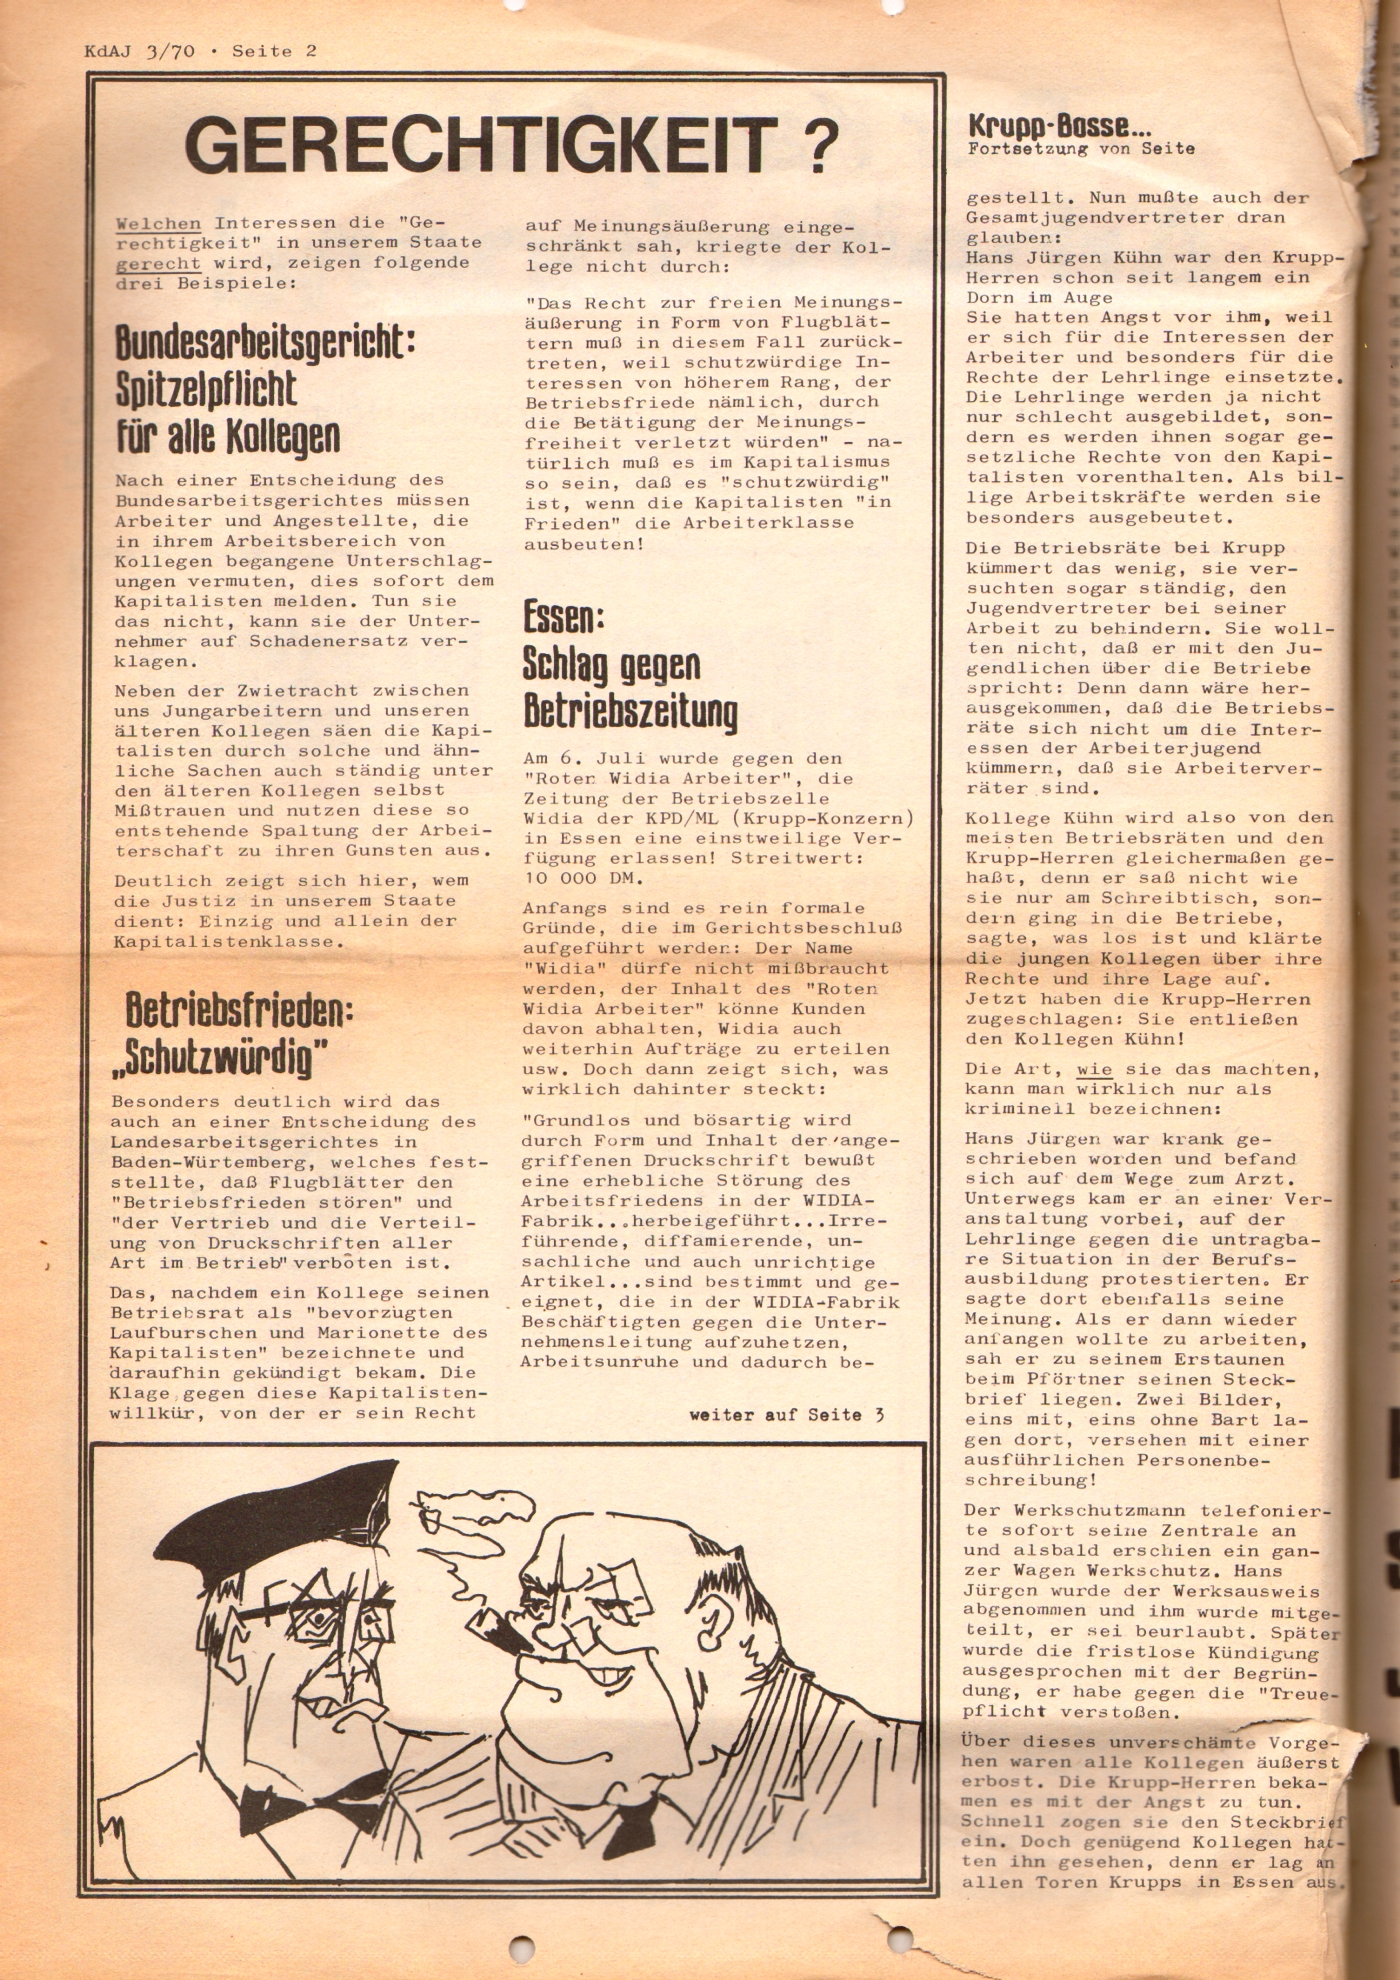 KDAJ, 1. Jg., August 1970, Nr. 3, Seite 2